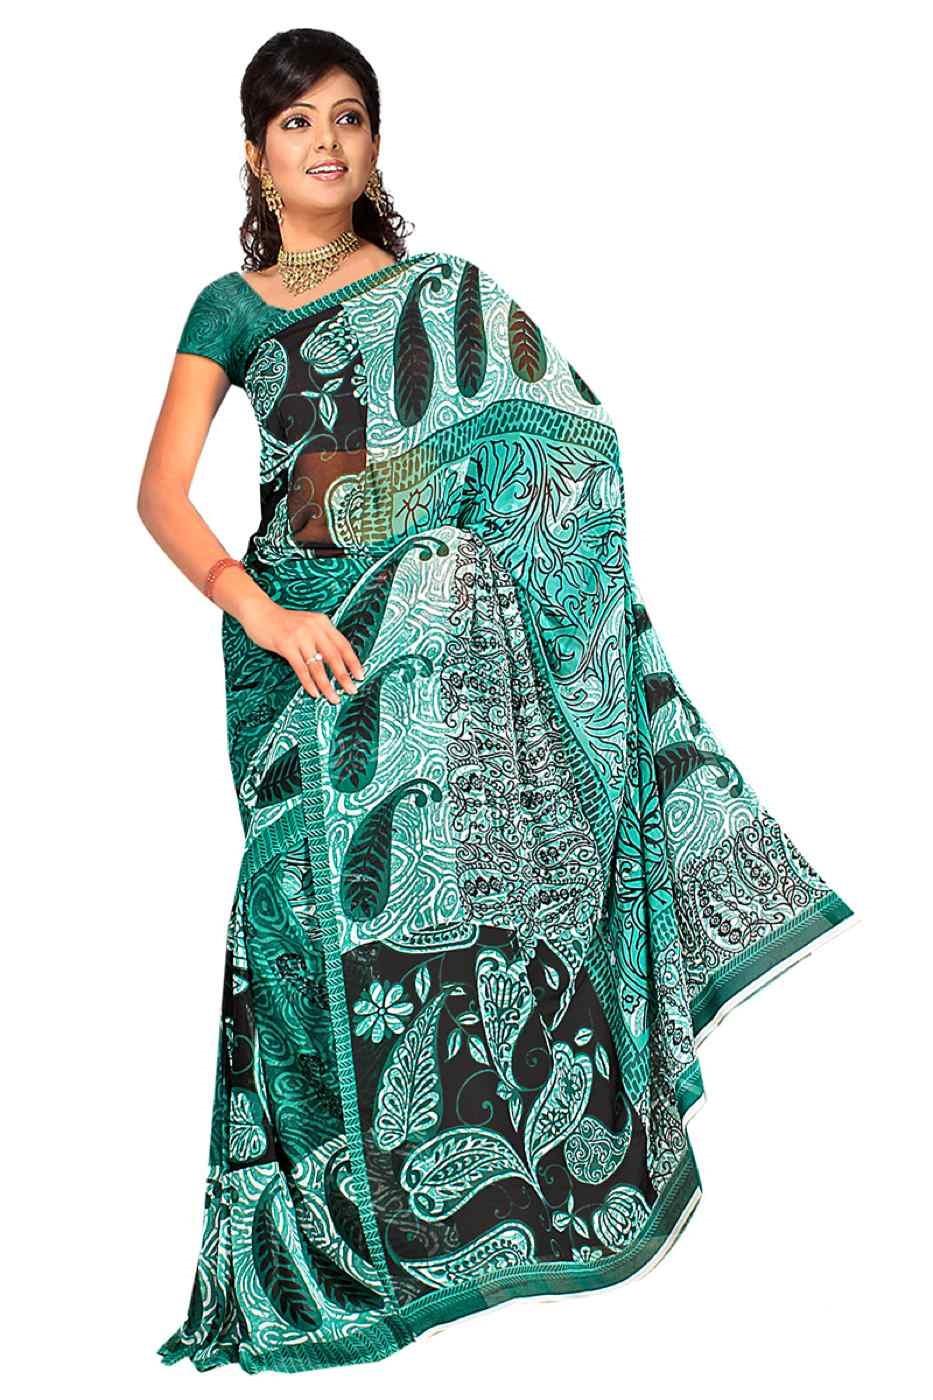 Chitrani Georgette Printed Casual Saree Sari Bellydance fabric